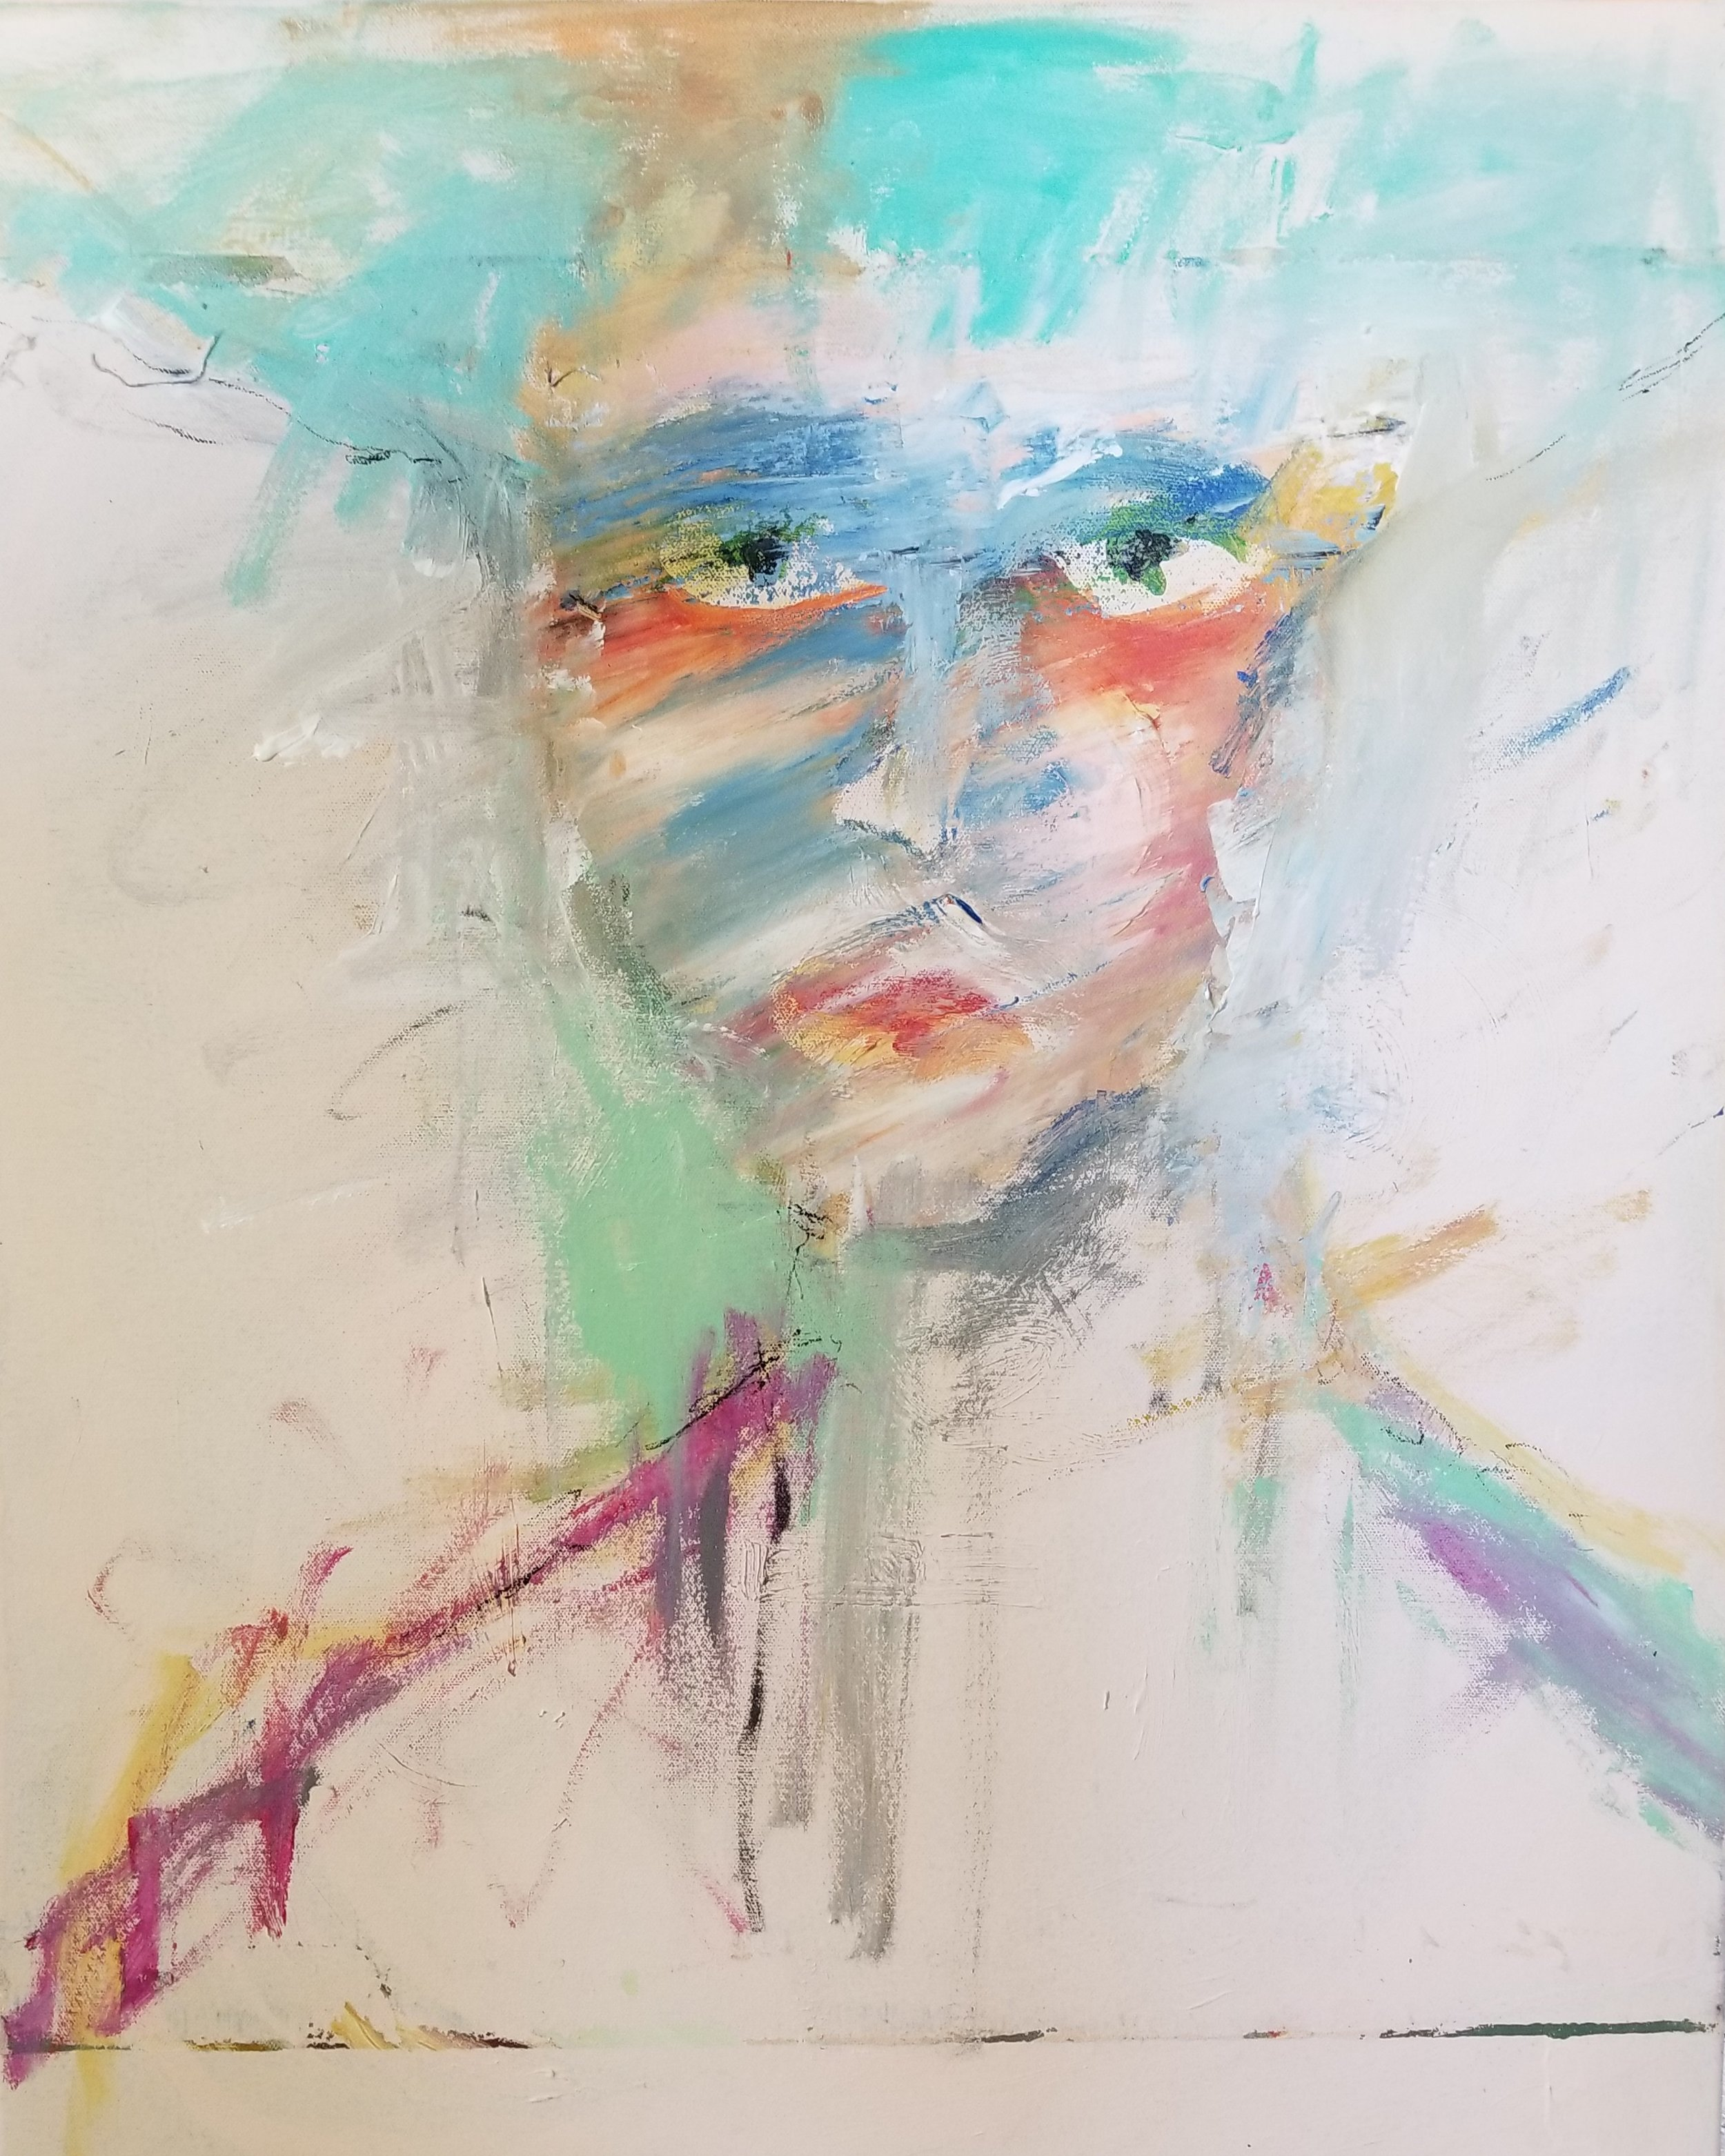 ARDREWART Self-PortraitwithJP AcrylicOilAStickCanvas 30x24 2018 Price2800.jpg